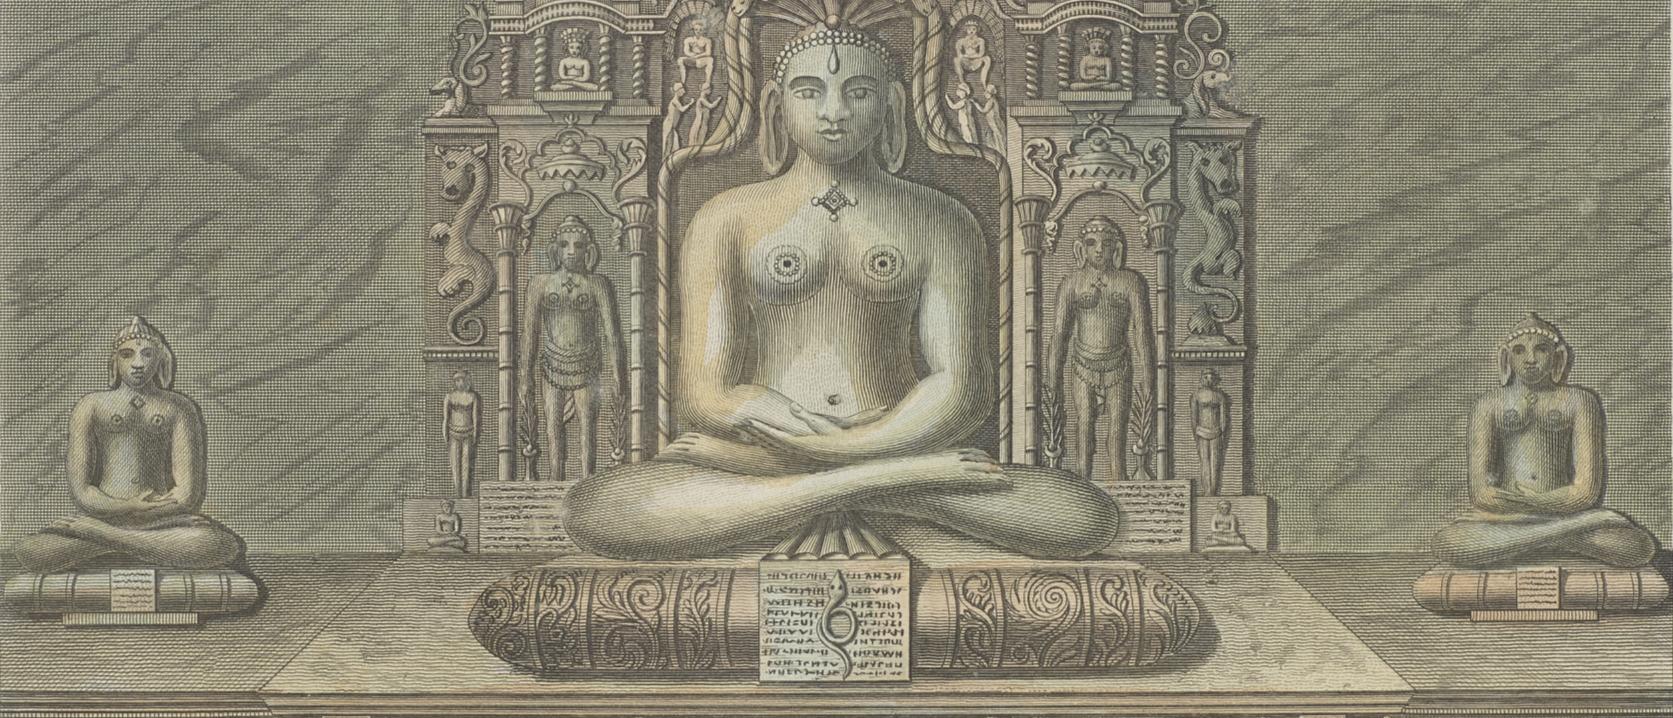 Print depicting a seated Hindu sculpture